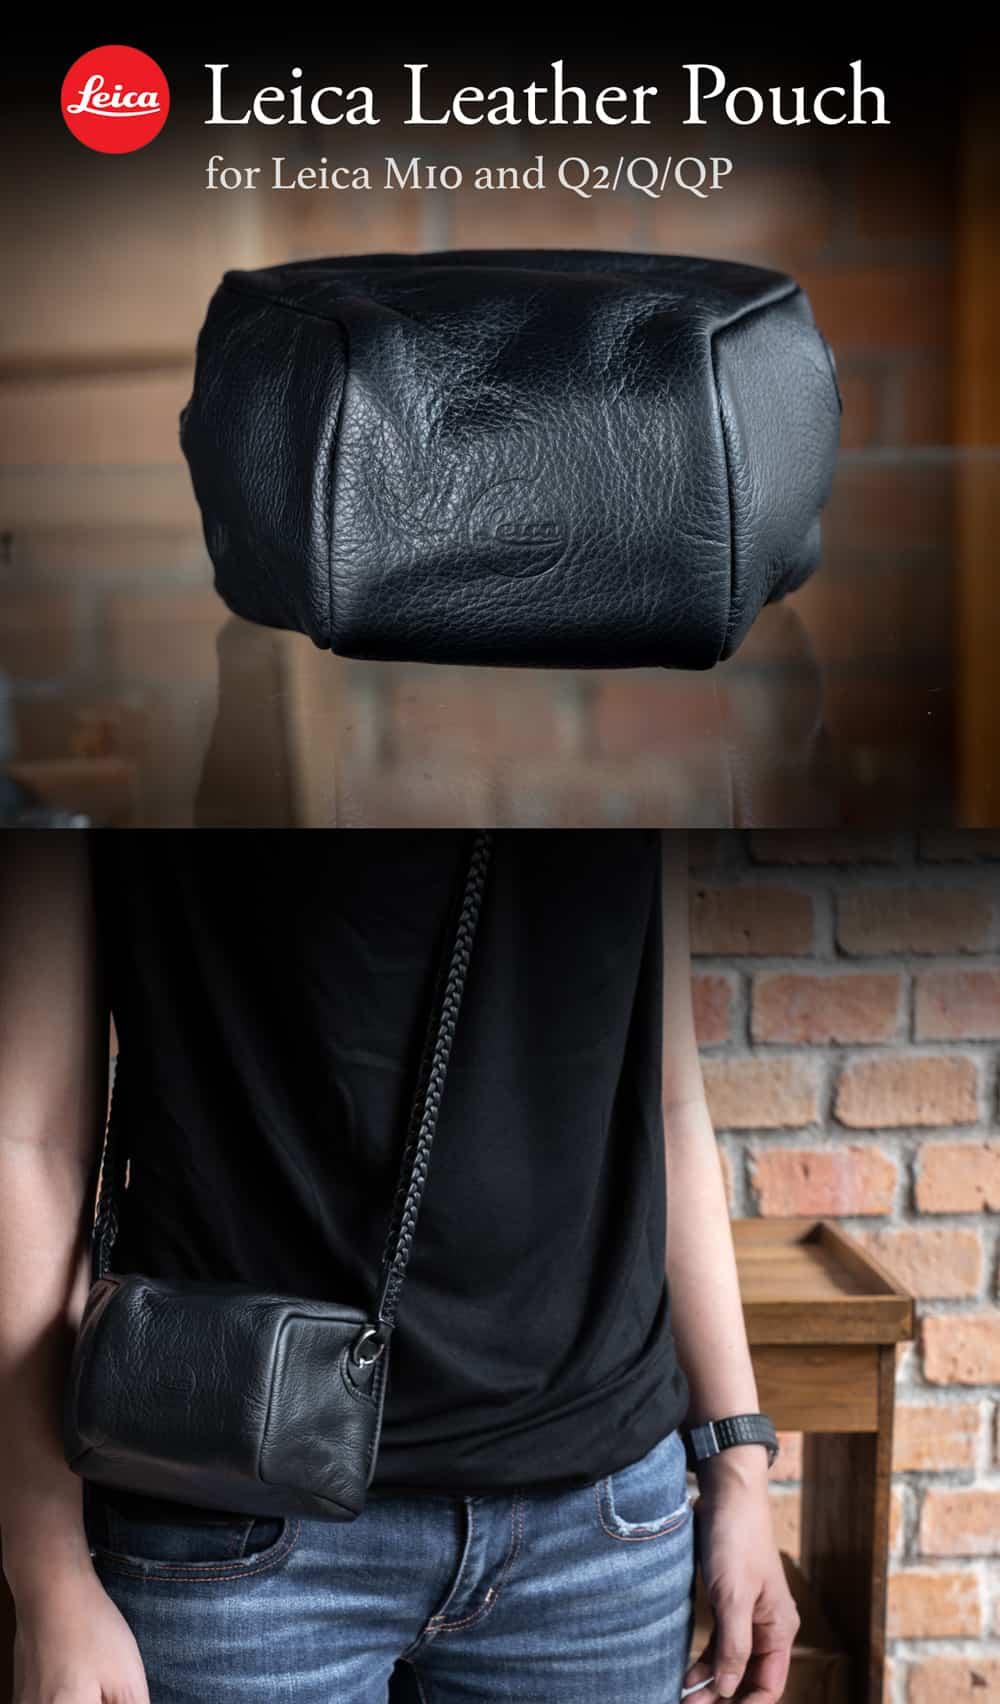 Leica Leather Pouch Original ซองหนังแท้ Leica